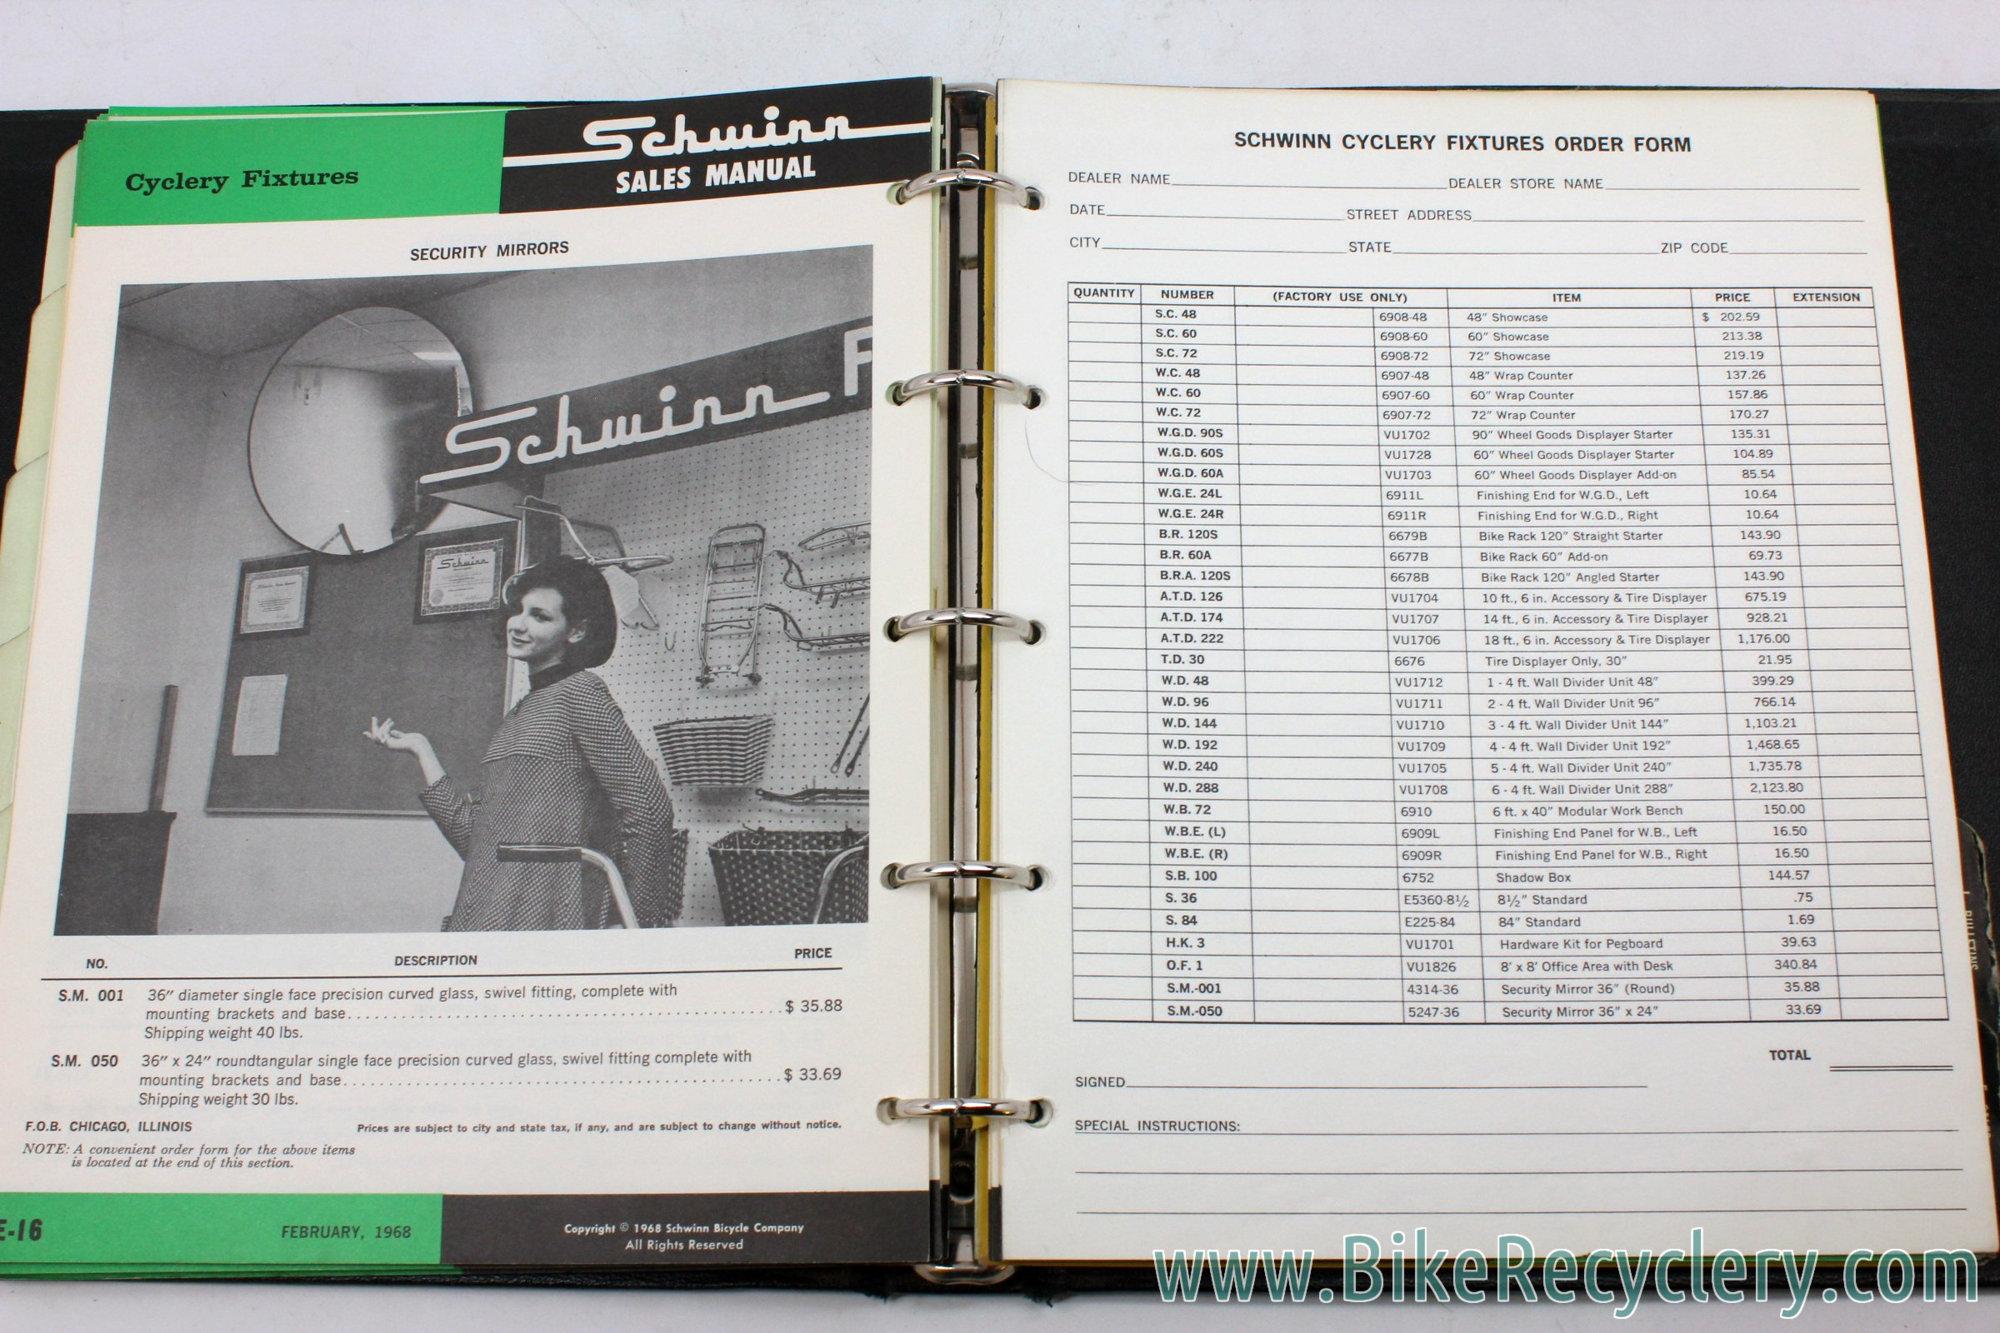 vintage_schwinn_memorabilia_catalogs_dealer_service_manuals_17824.JPG